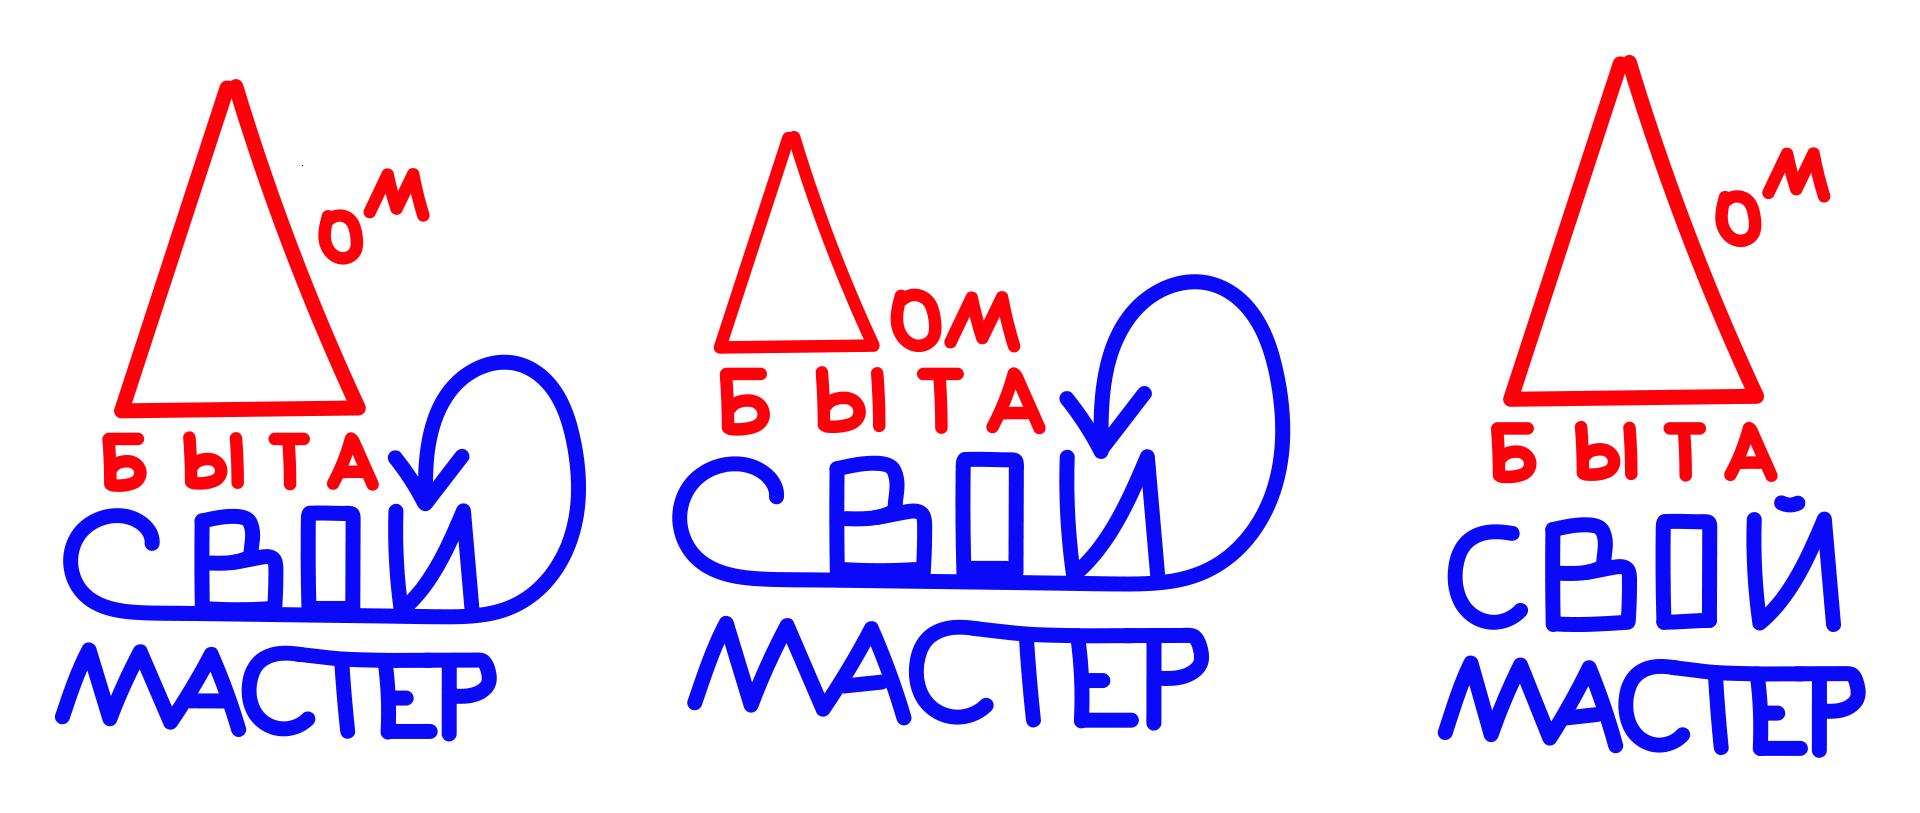 Логотип для сетевого ДОМ БЫТА фото f_8575d722f64e0ead.jpg